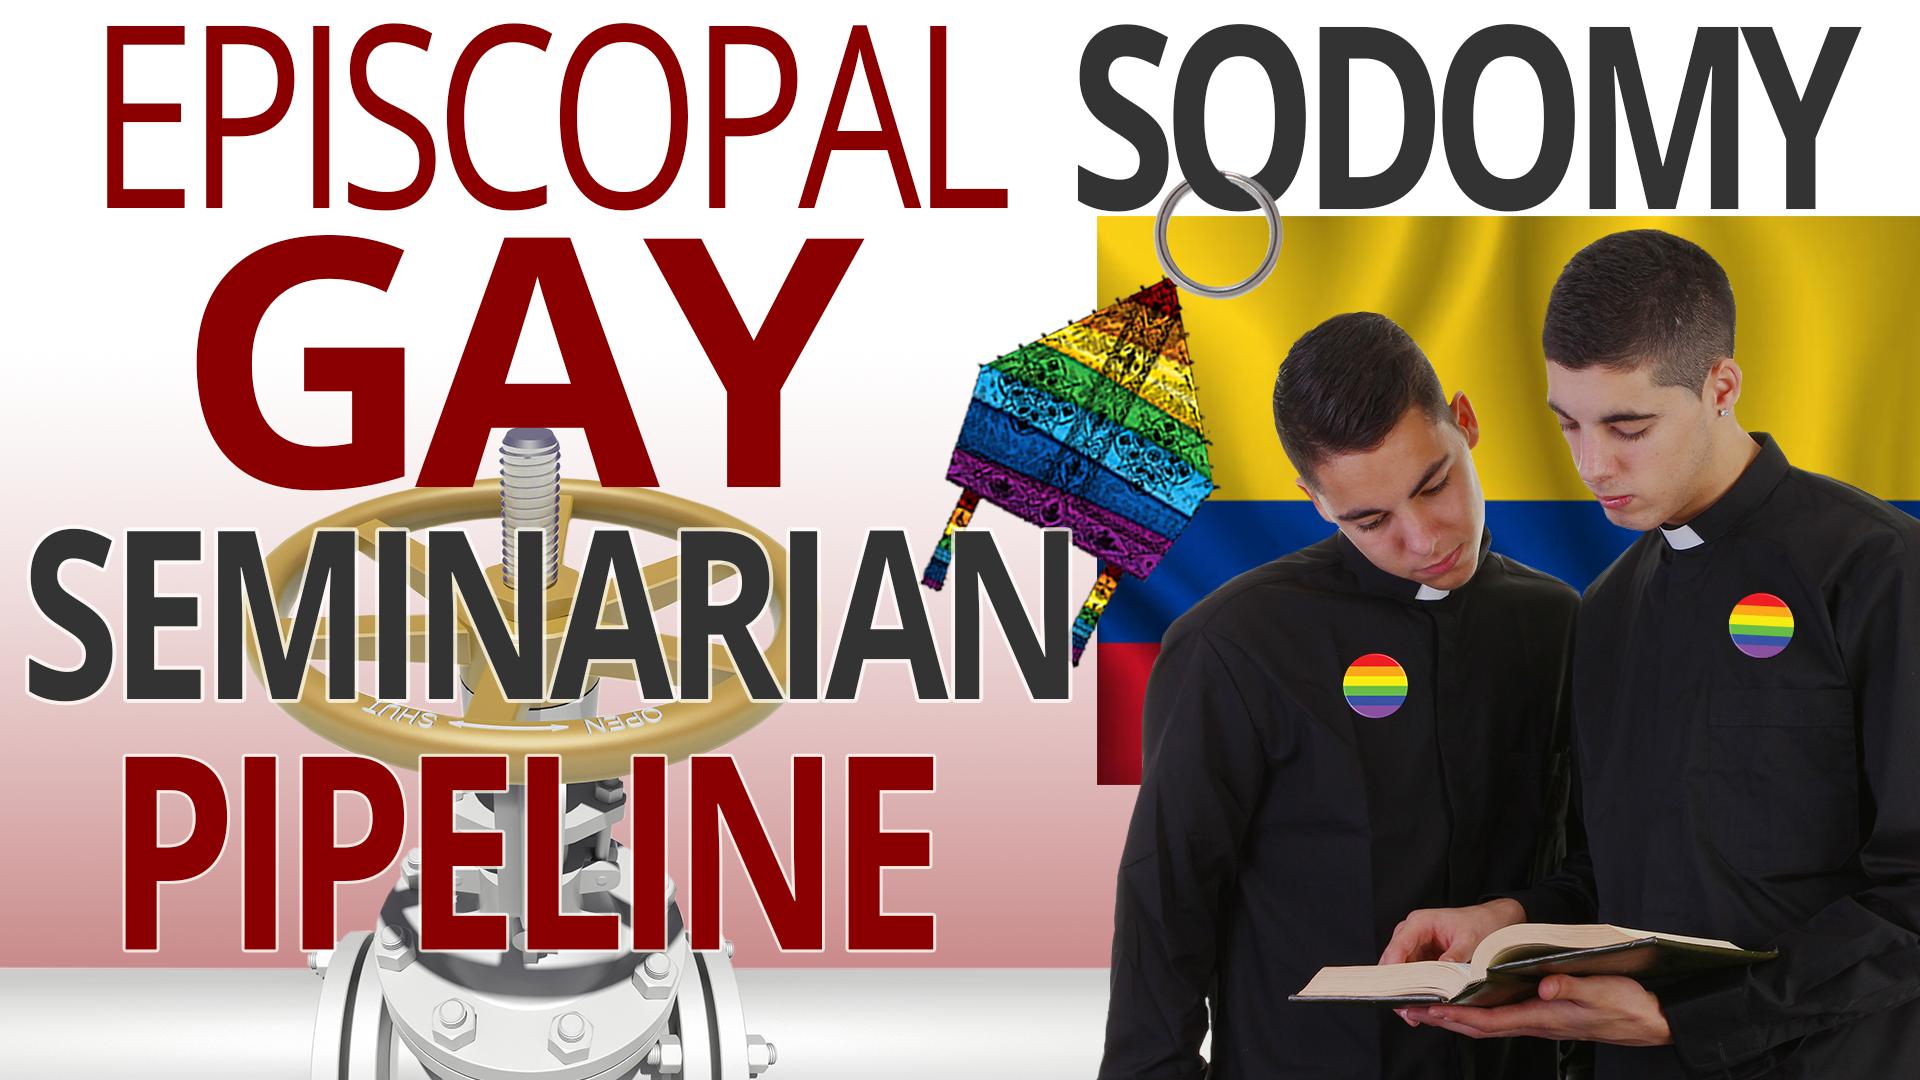 Episcopal Sodomy: Gay Seminarian Pipeline